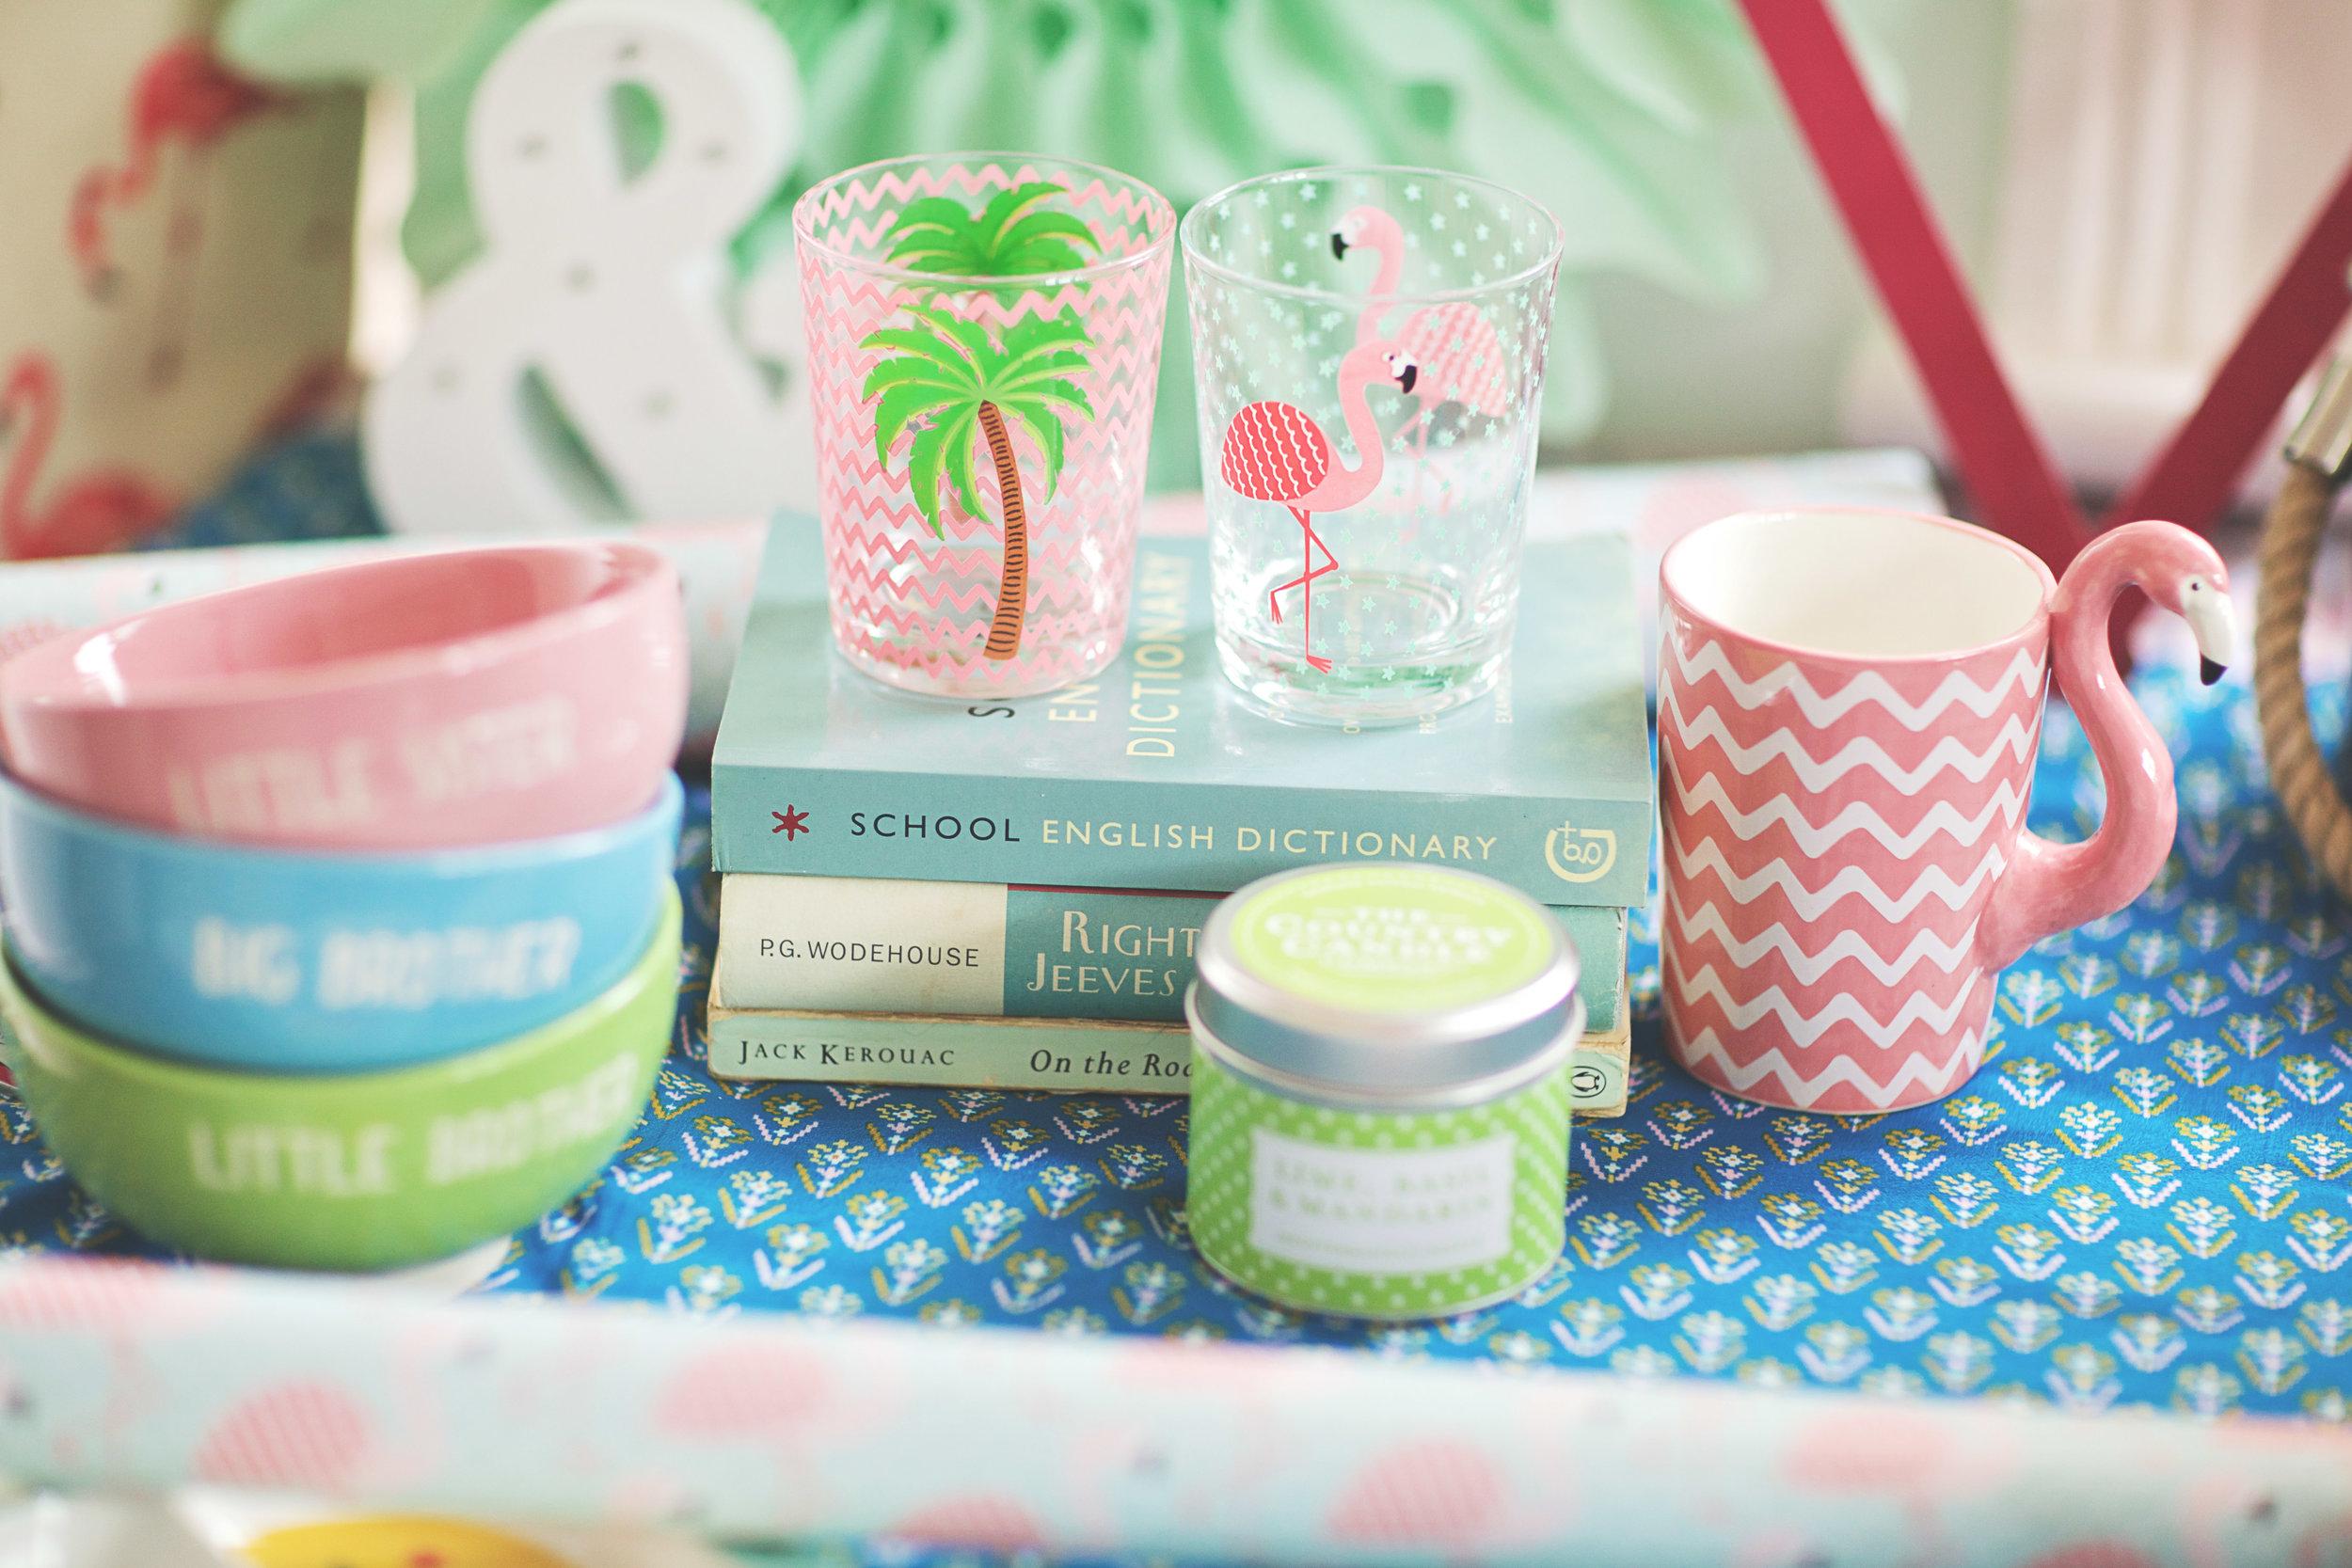 Palm Tree/Flamingo Glass: £2.50 // Flamingo Mug: £8.50 // Sister/Brother bowls: £10.00